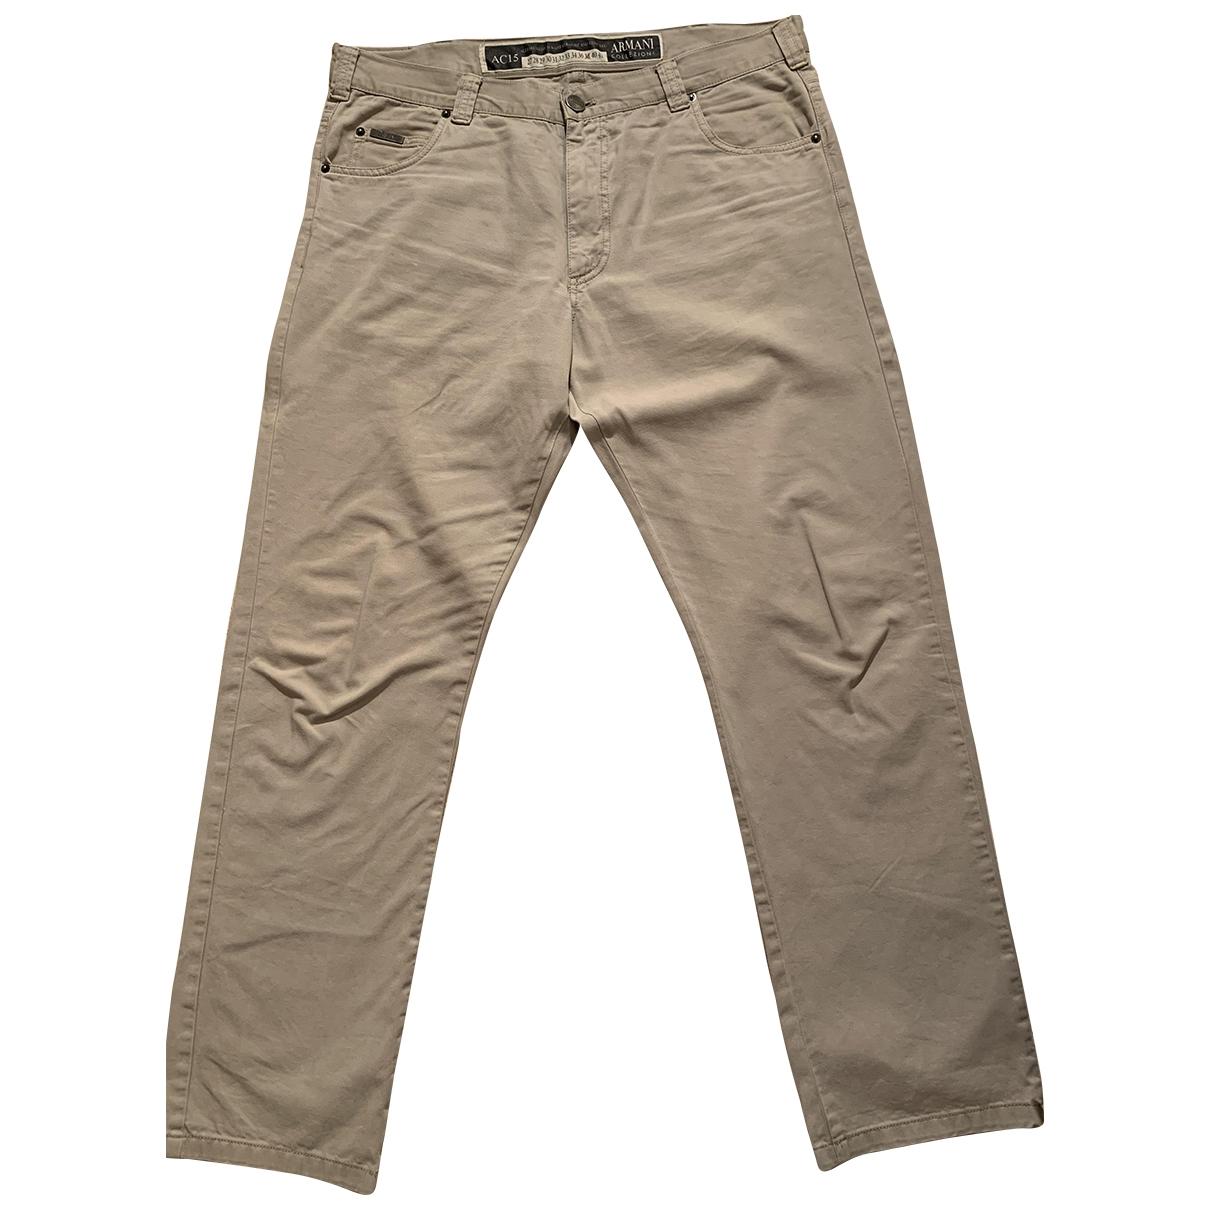 Armani Collezioni \N Beige Cotton Trousers for Men 38 UK - US